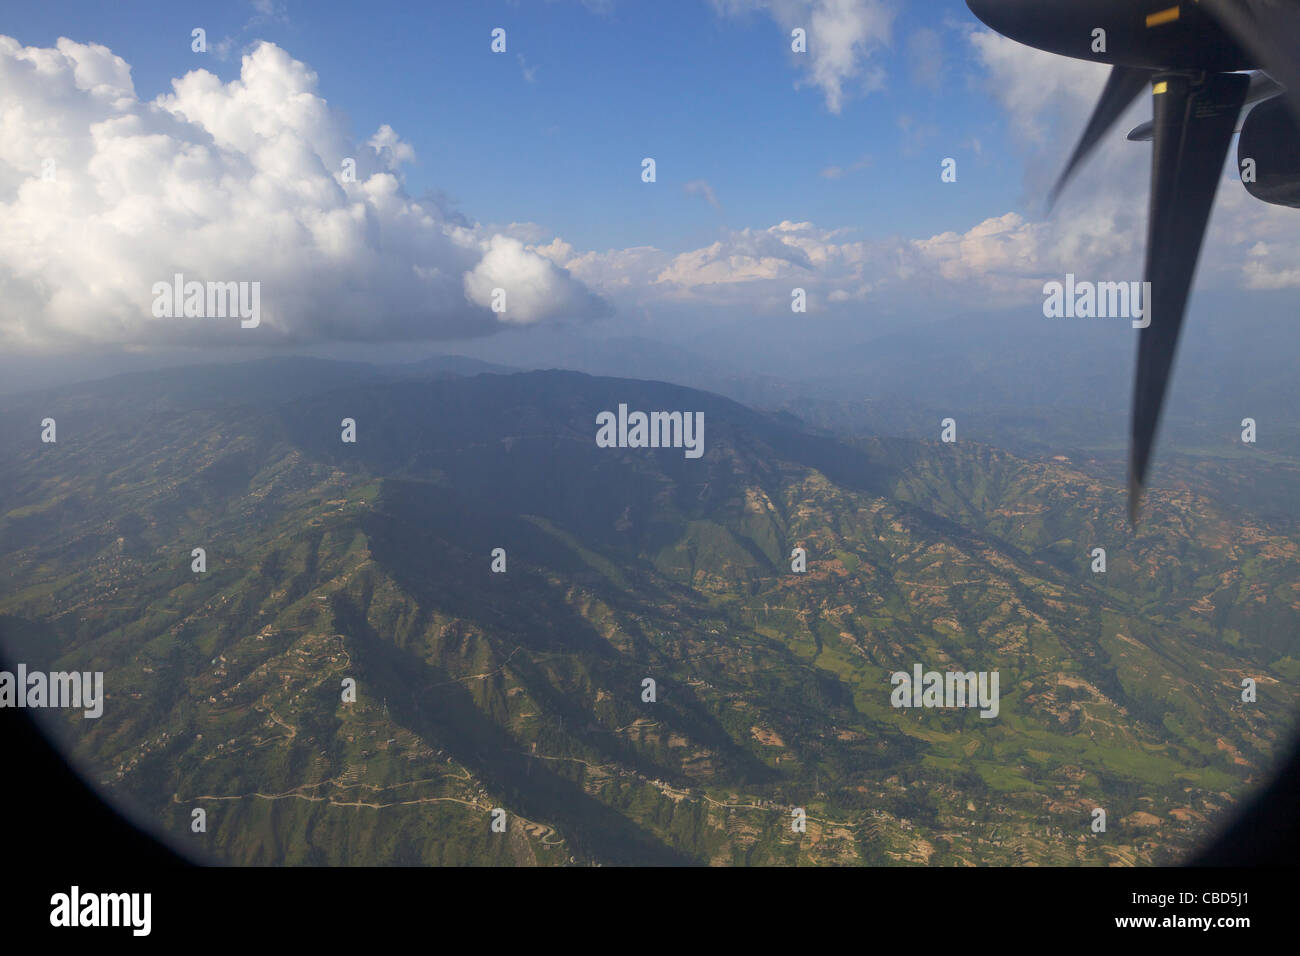 Kathmandu Valley, aerial photograph, Nepal, Asia - Stock Image